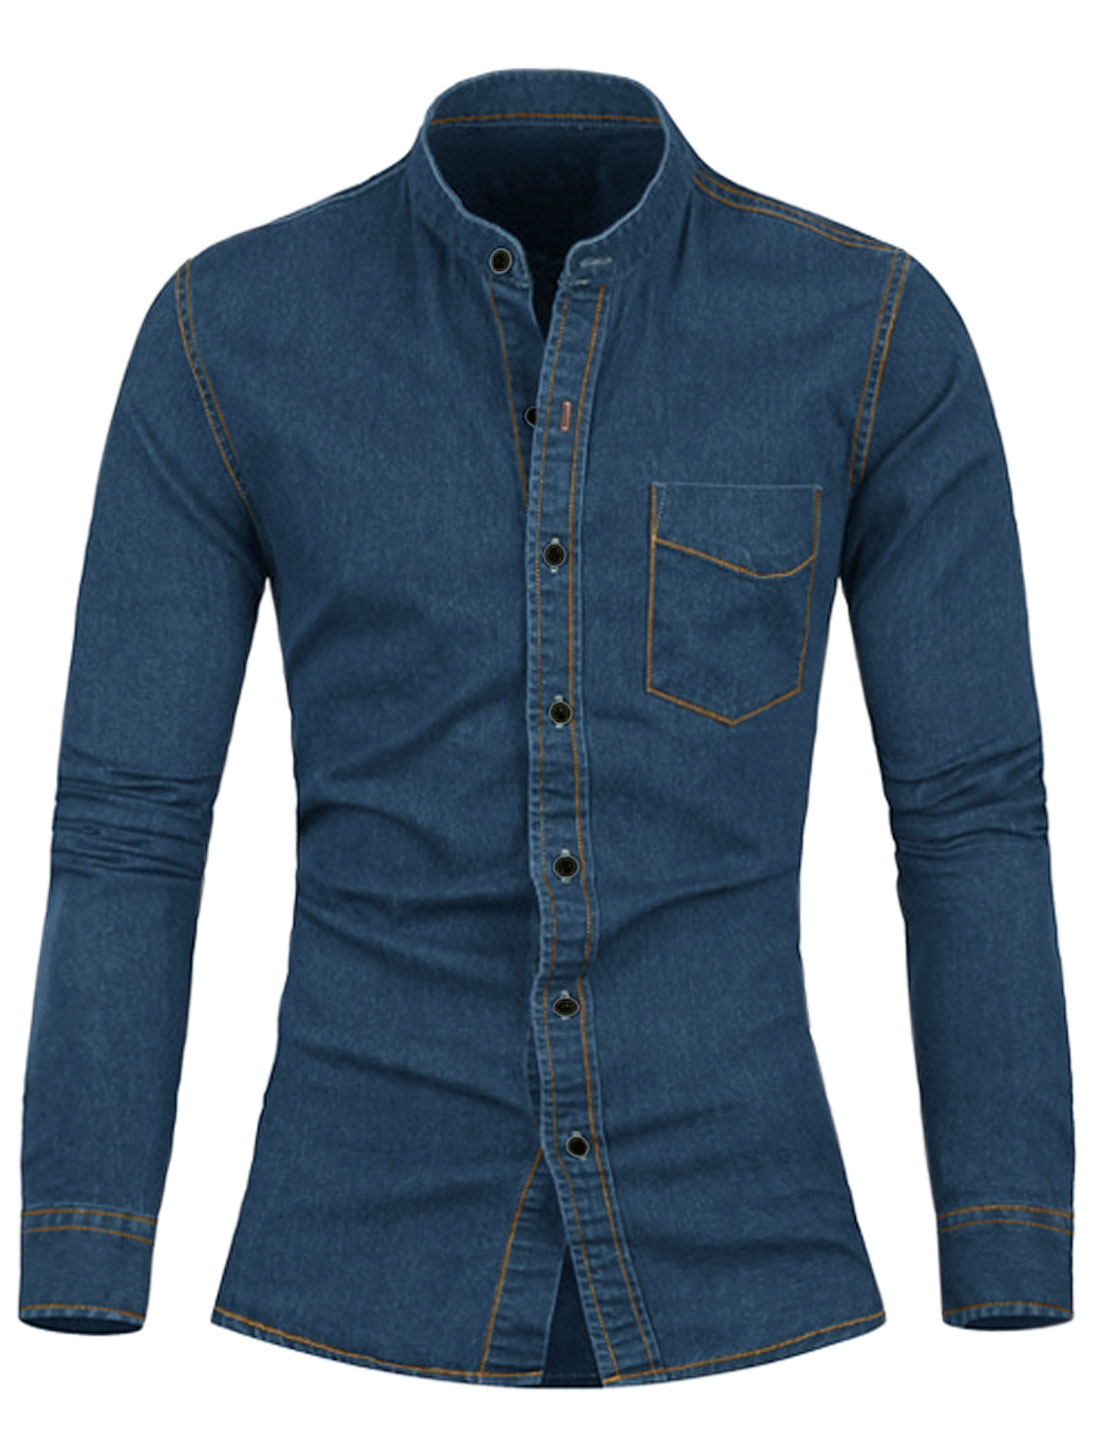 Men Stand Collar Chest Pocket Button Down Casual Denim Shirt Blue S